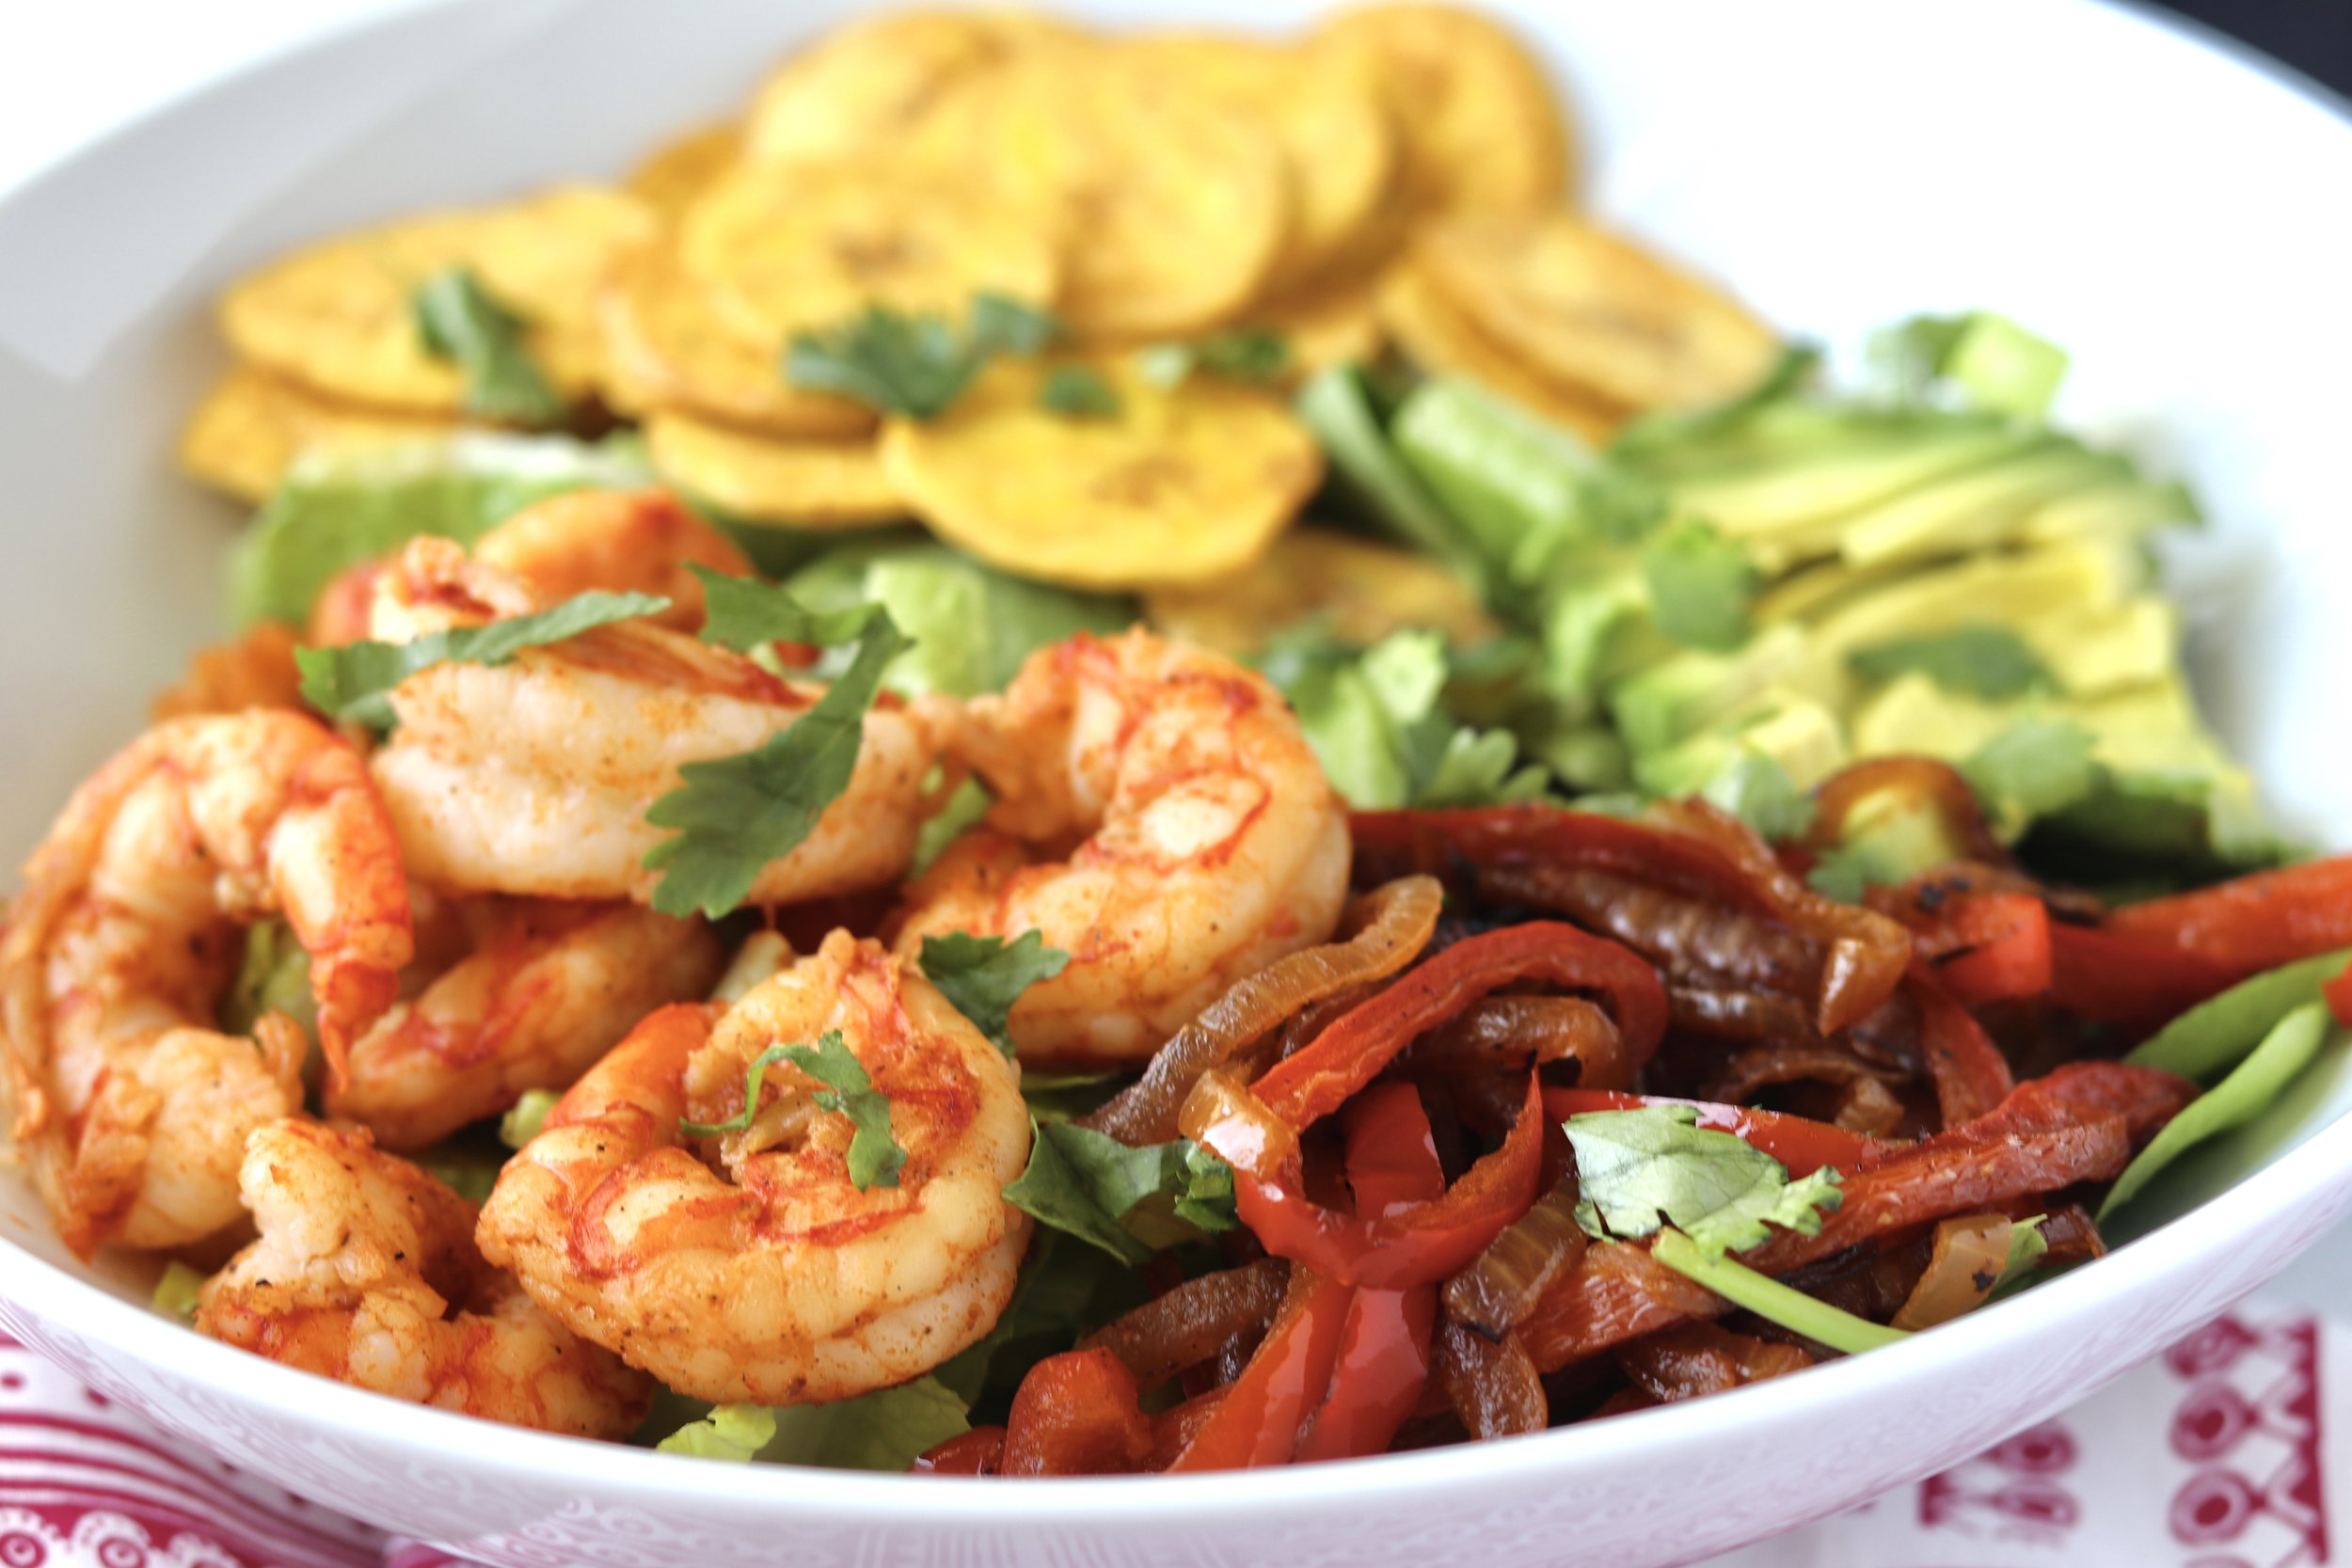 Shrimp Fajita Salad by I'd Eat That Food